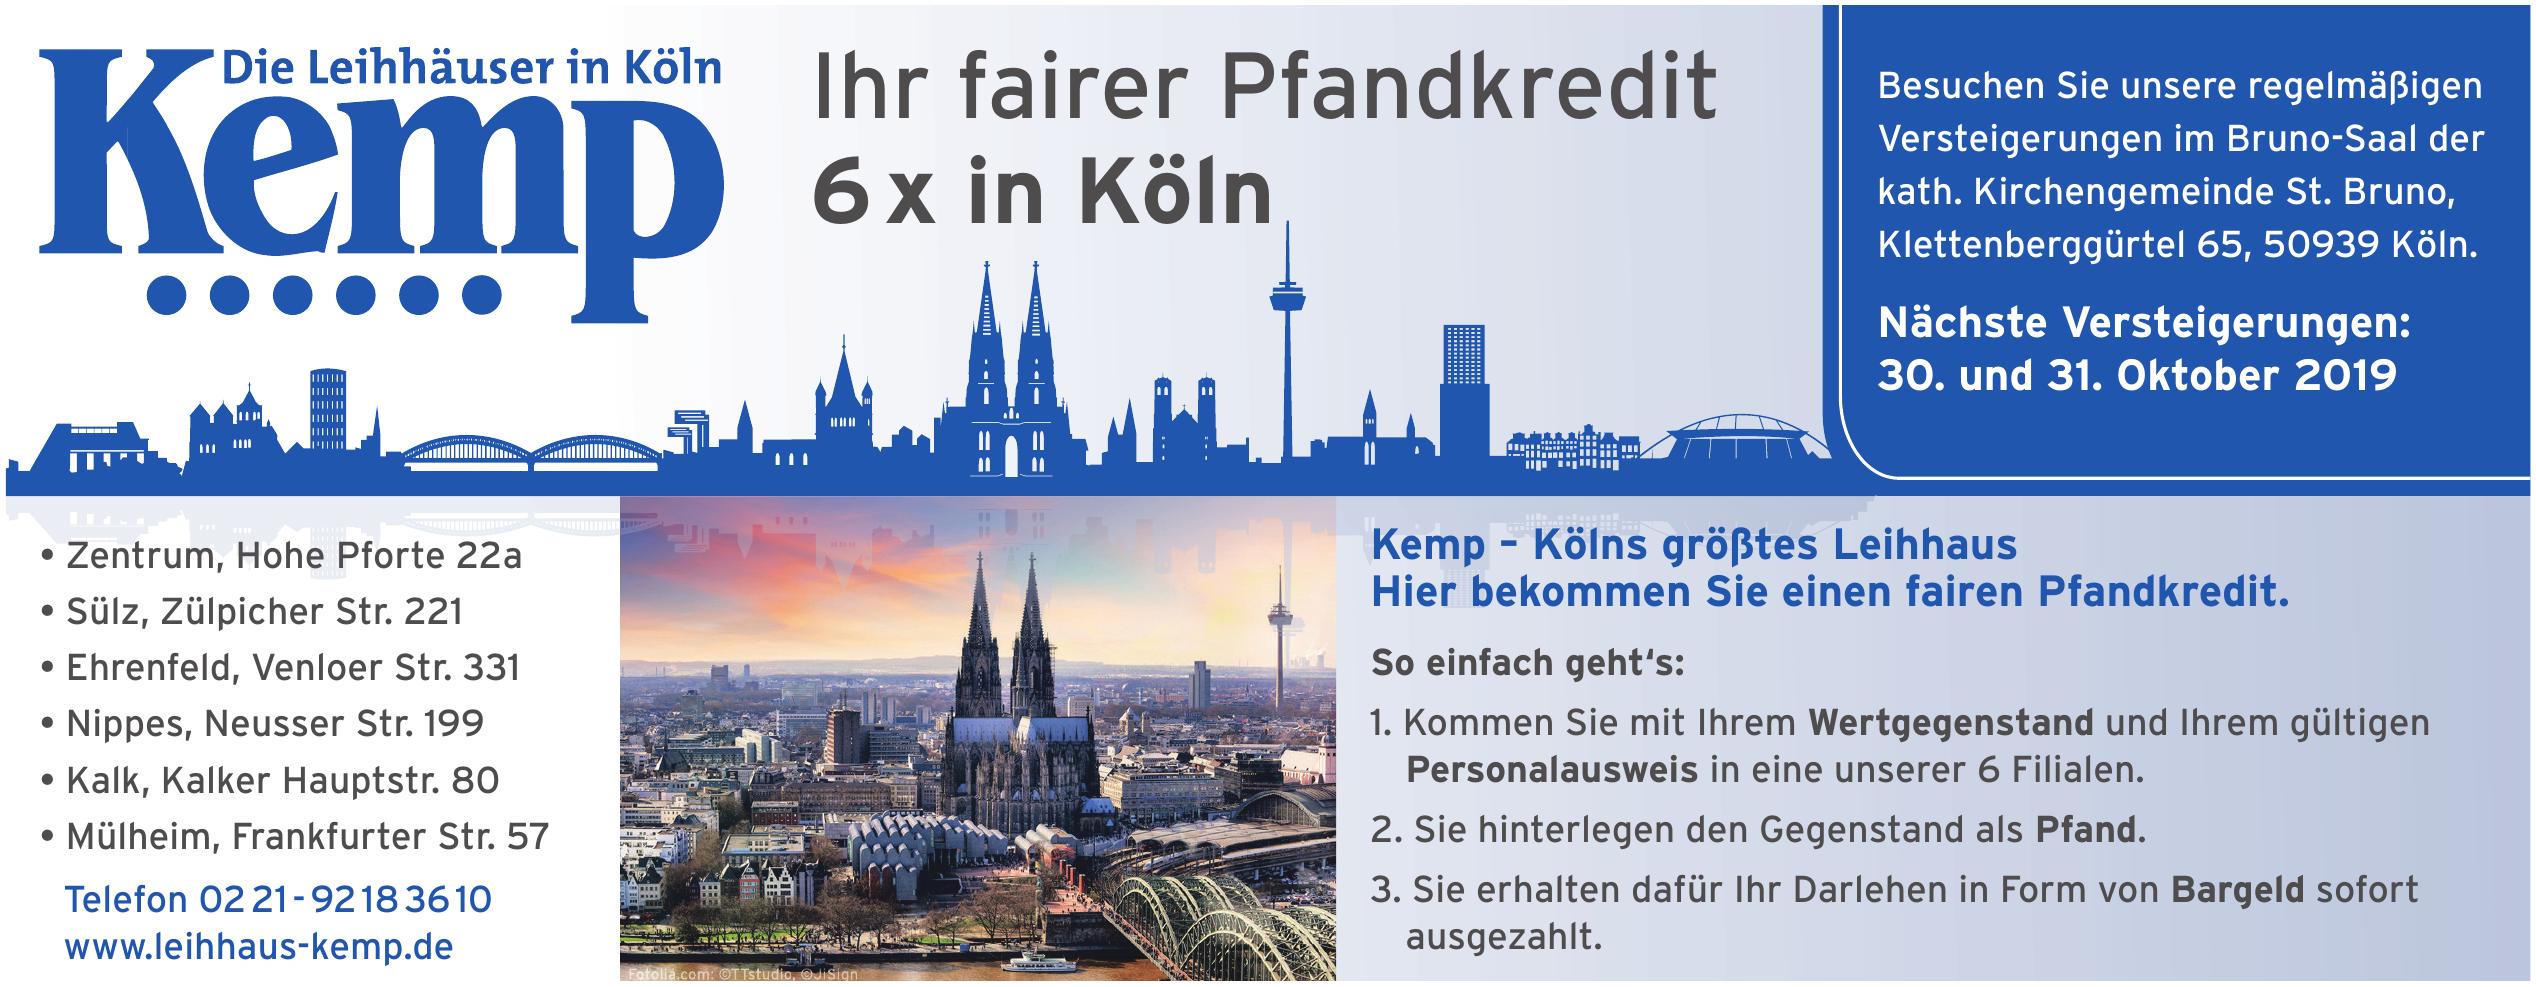 Leihhäuser Kemp GmbH